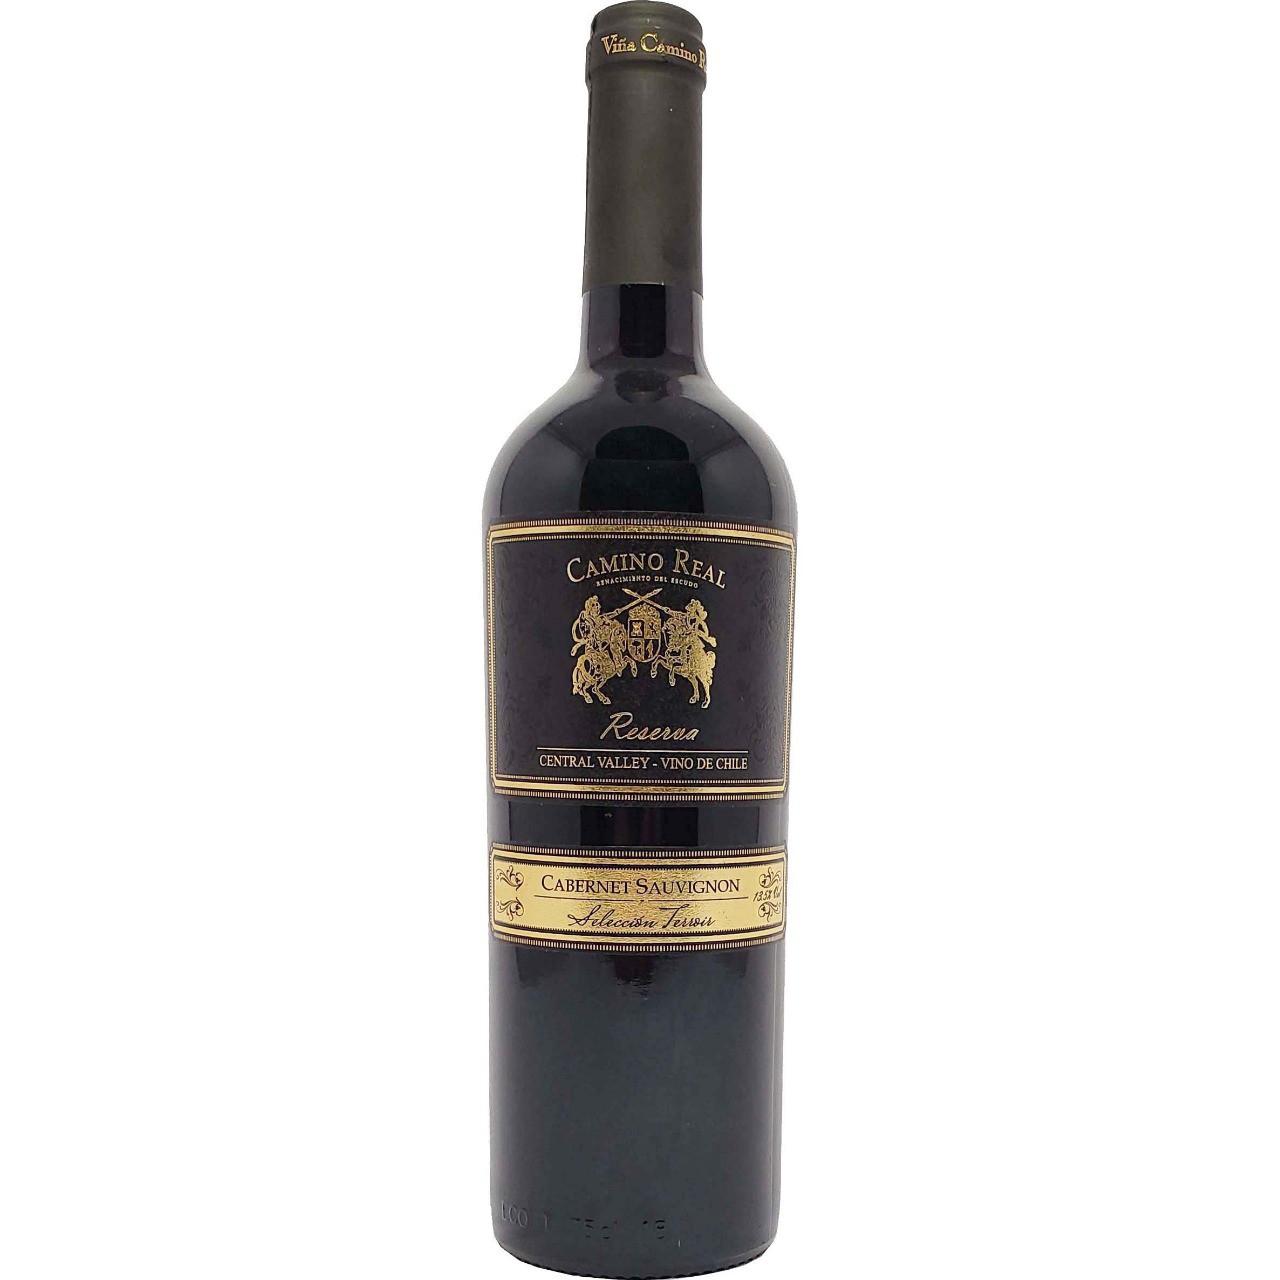 Vinho Tinto Camino Real Reserva Cabernet Sauvignon - 750ml -